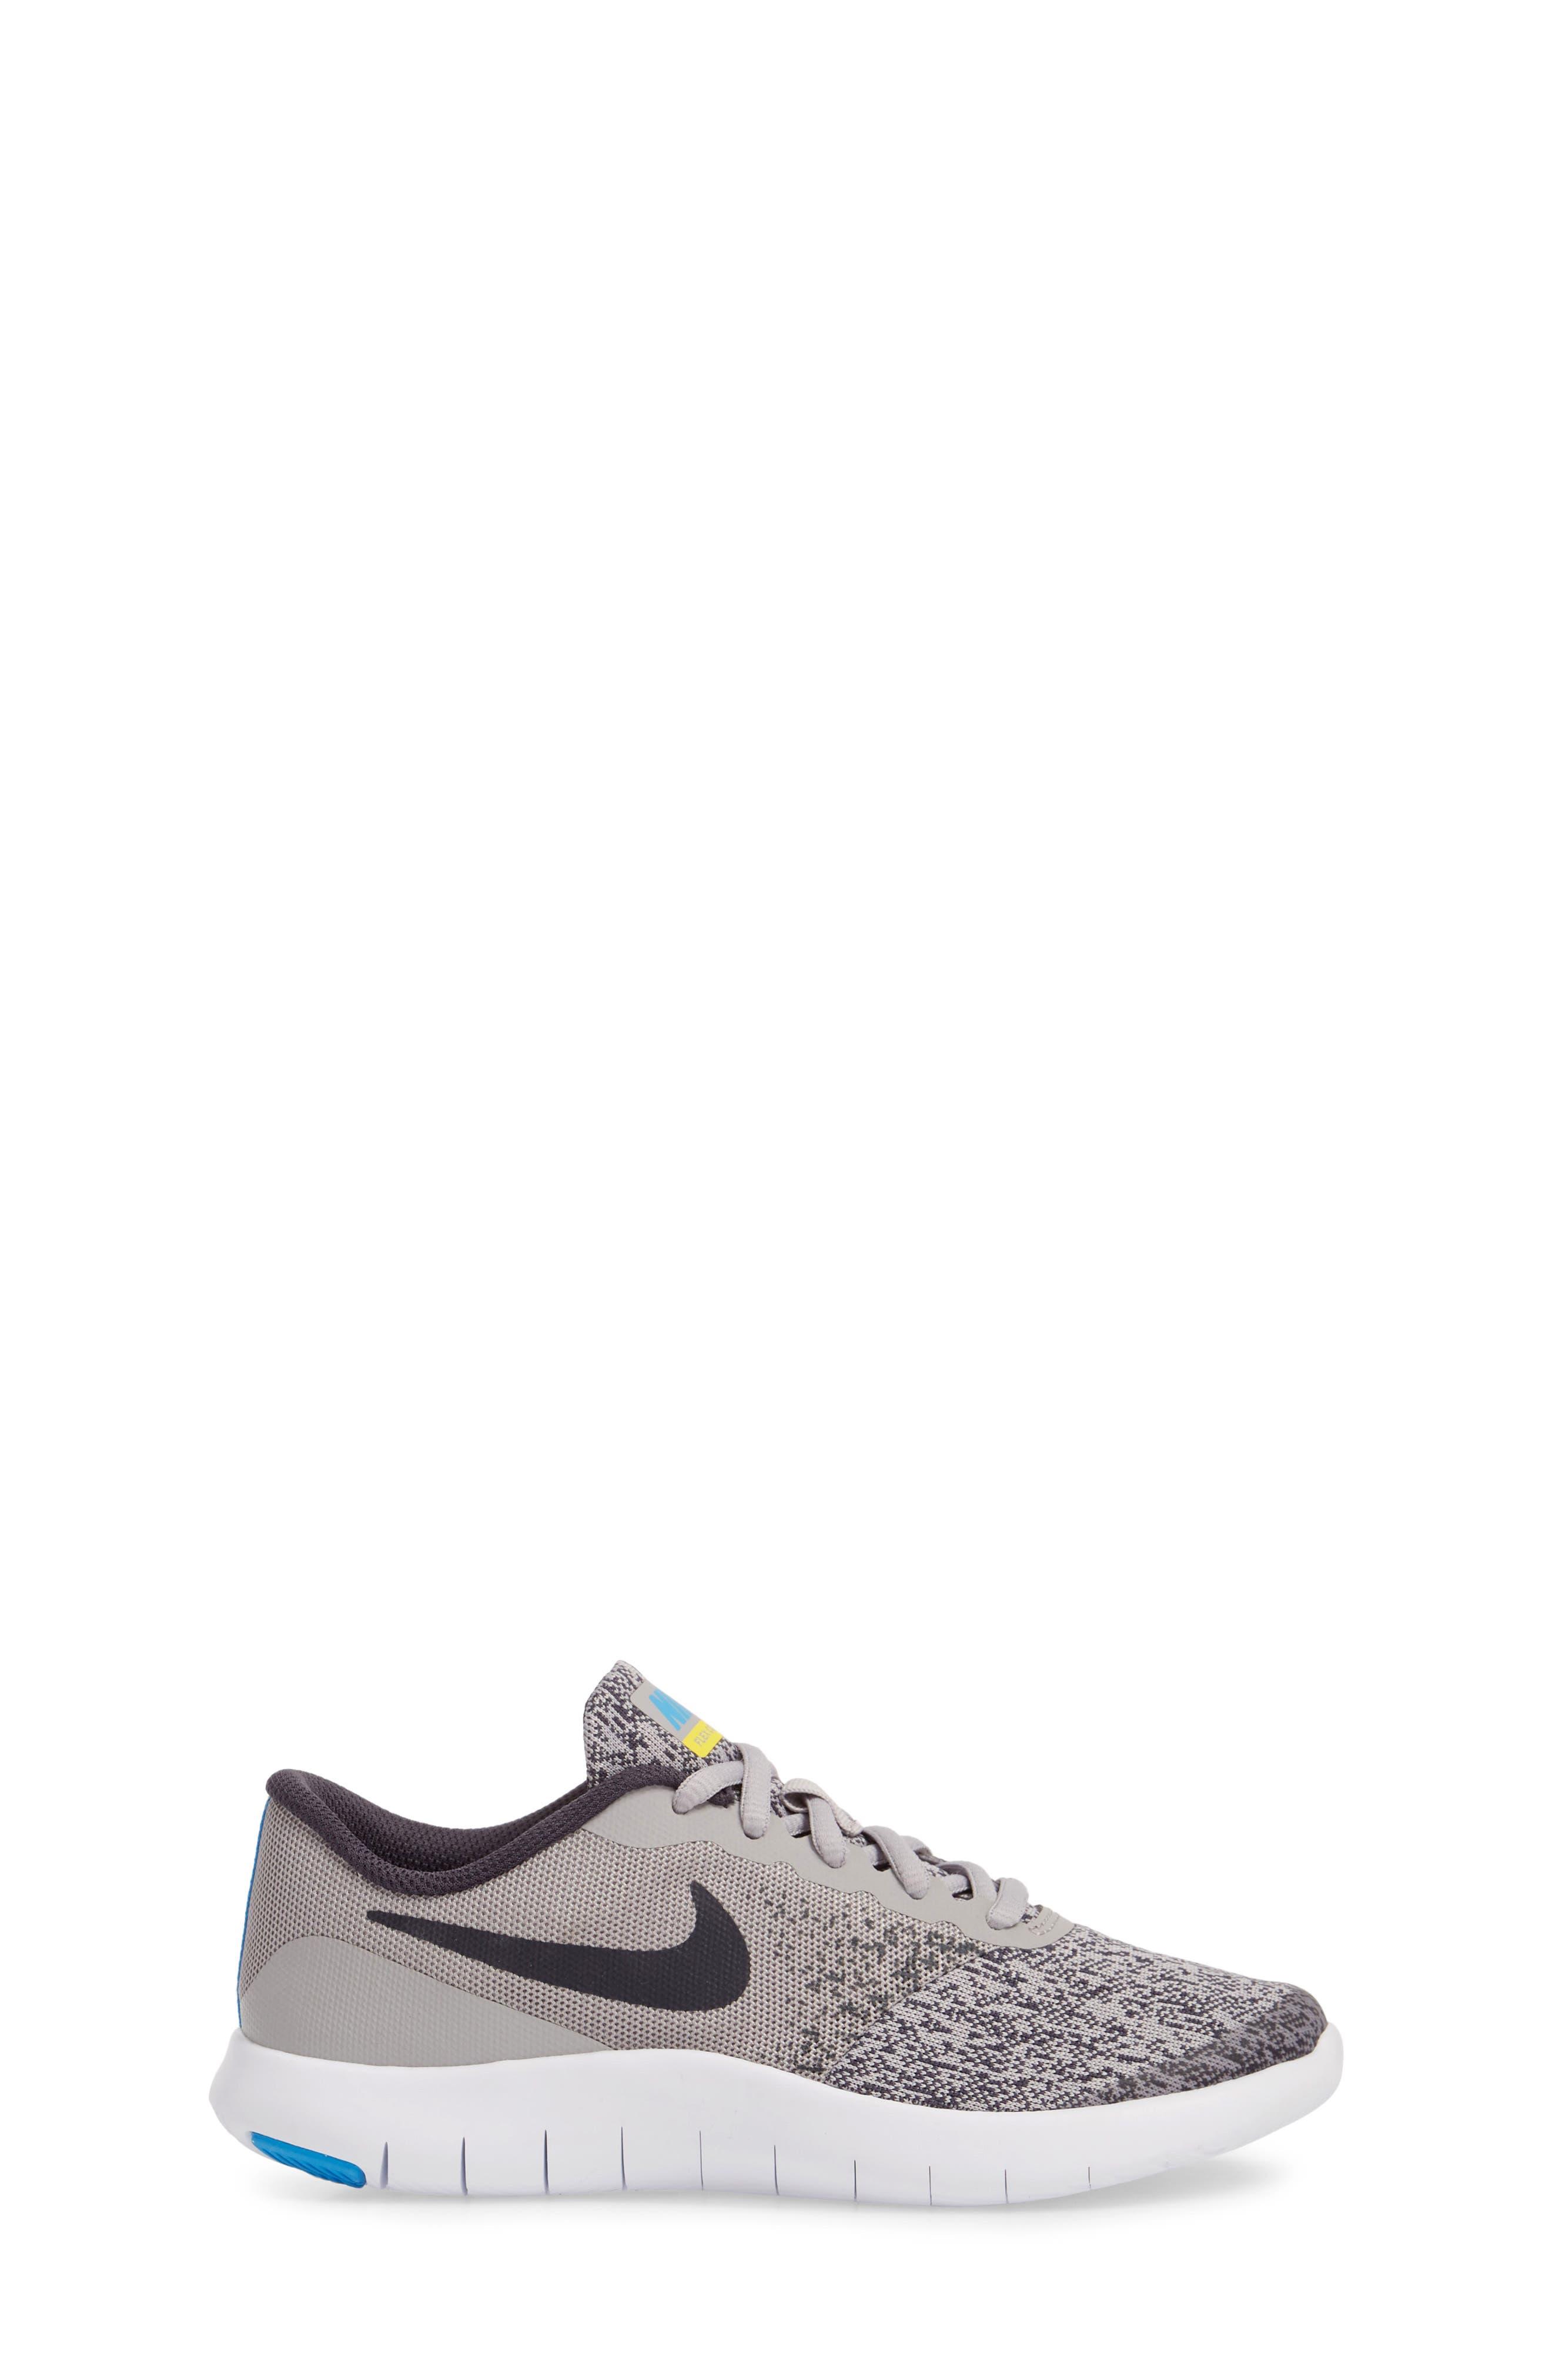 Flex Contact Running Shoe,                             Alternate thumbnail 3, color,                             ATMOSPHERE GREY/ LASER ORANGE